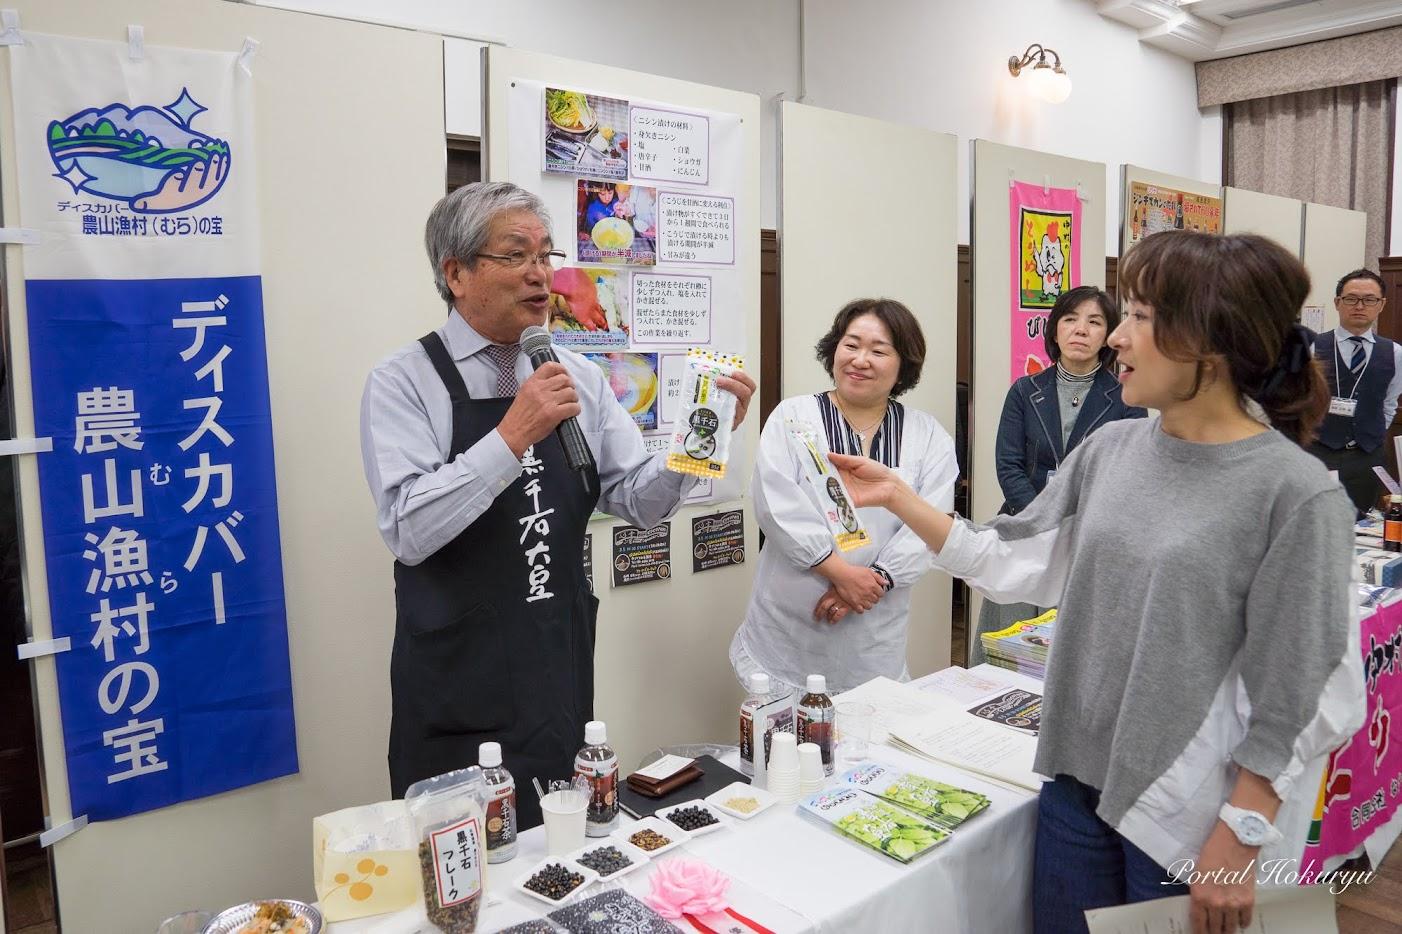 黒千石事業協同組合・高田幸男 理事長の説明